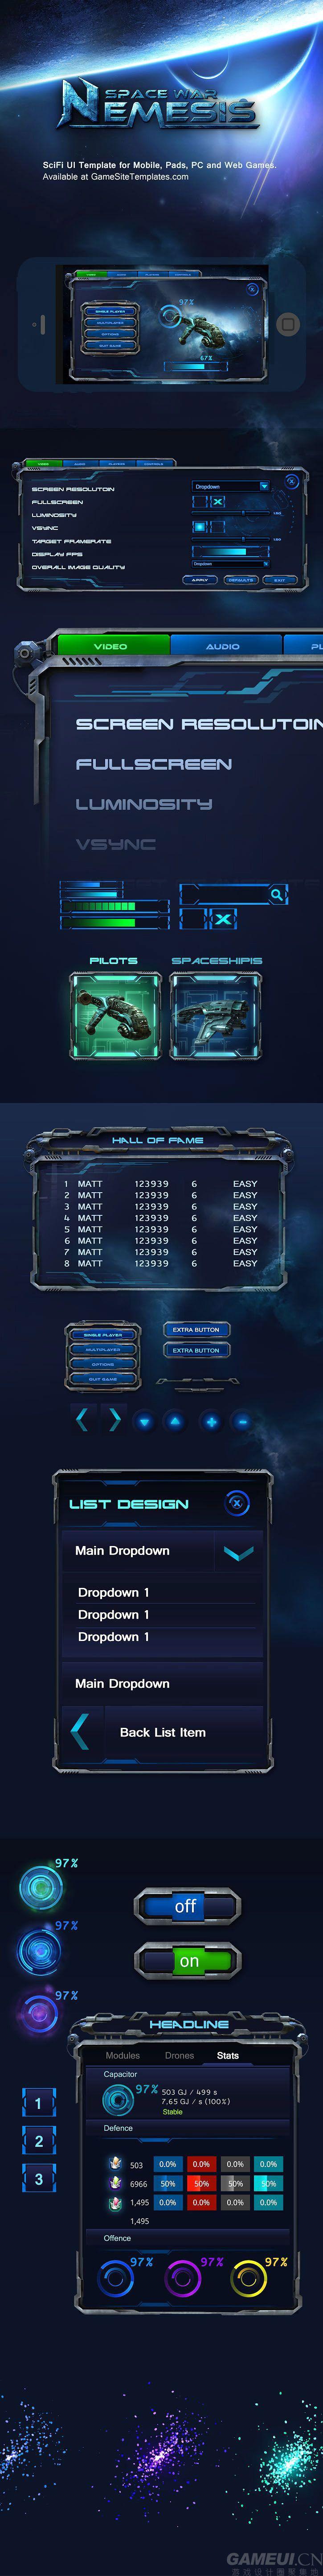 SpaceWar太空战争-科幻类游戏UI界面